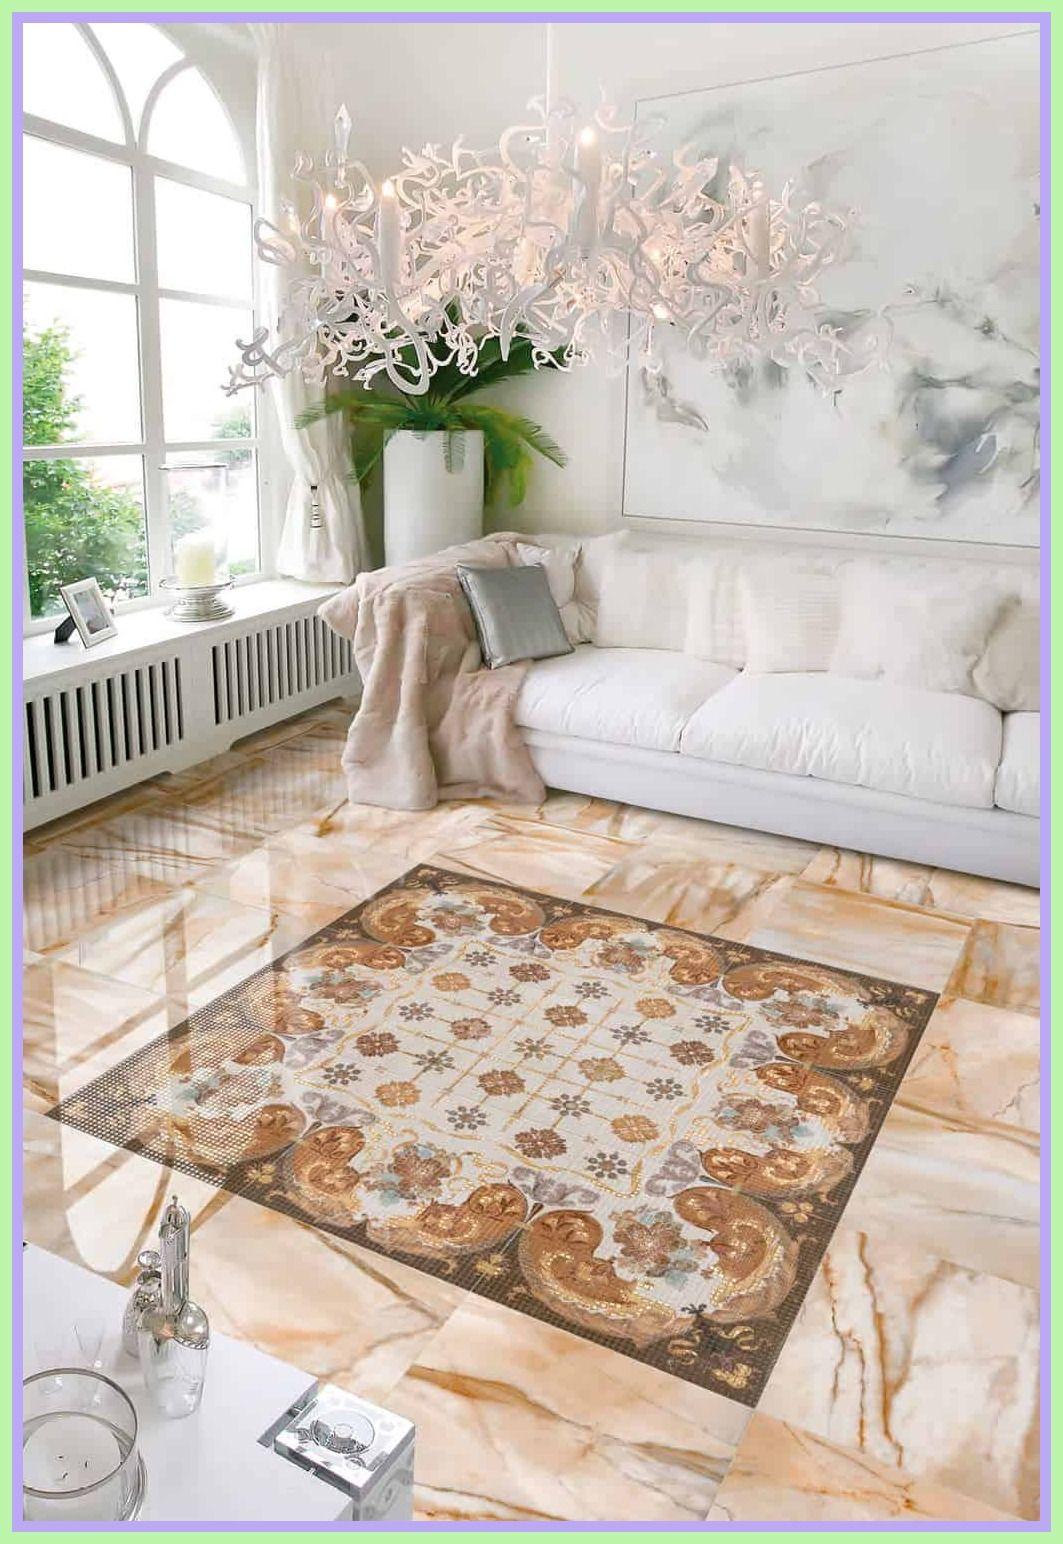 100 Reference Of Floor Tile Living Room Shower Stall In